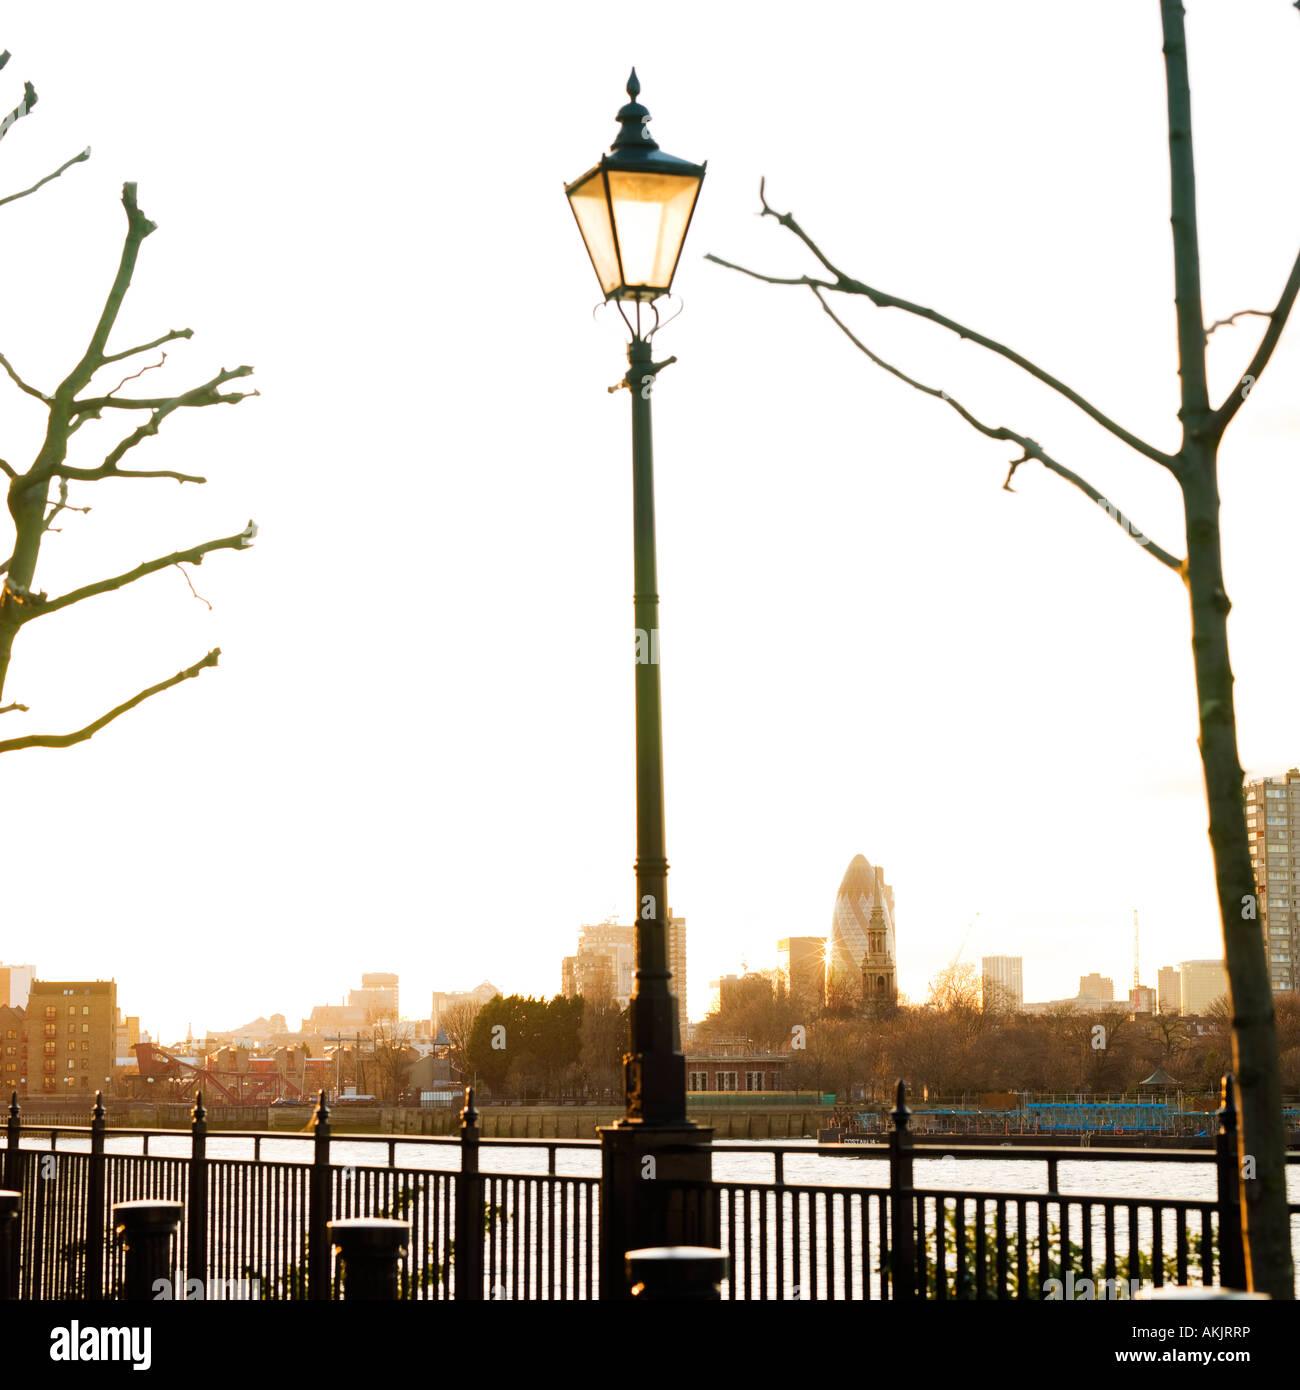 Winter Thames London Skyline With Victorian Lamp Post Lantern